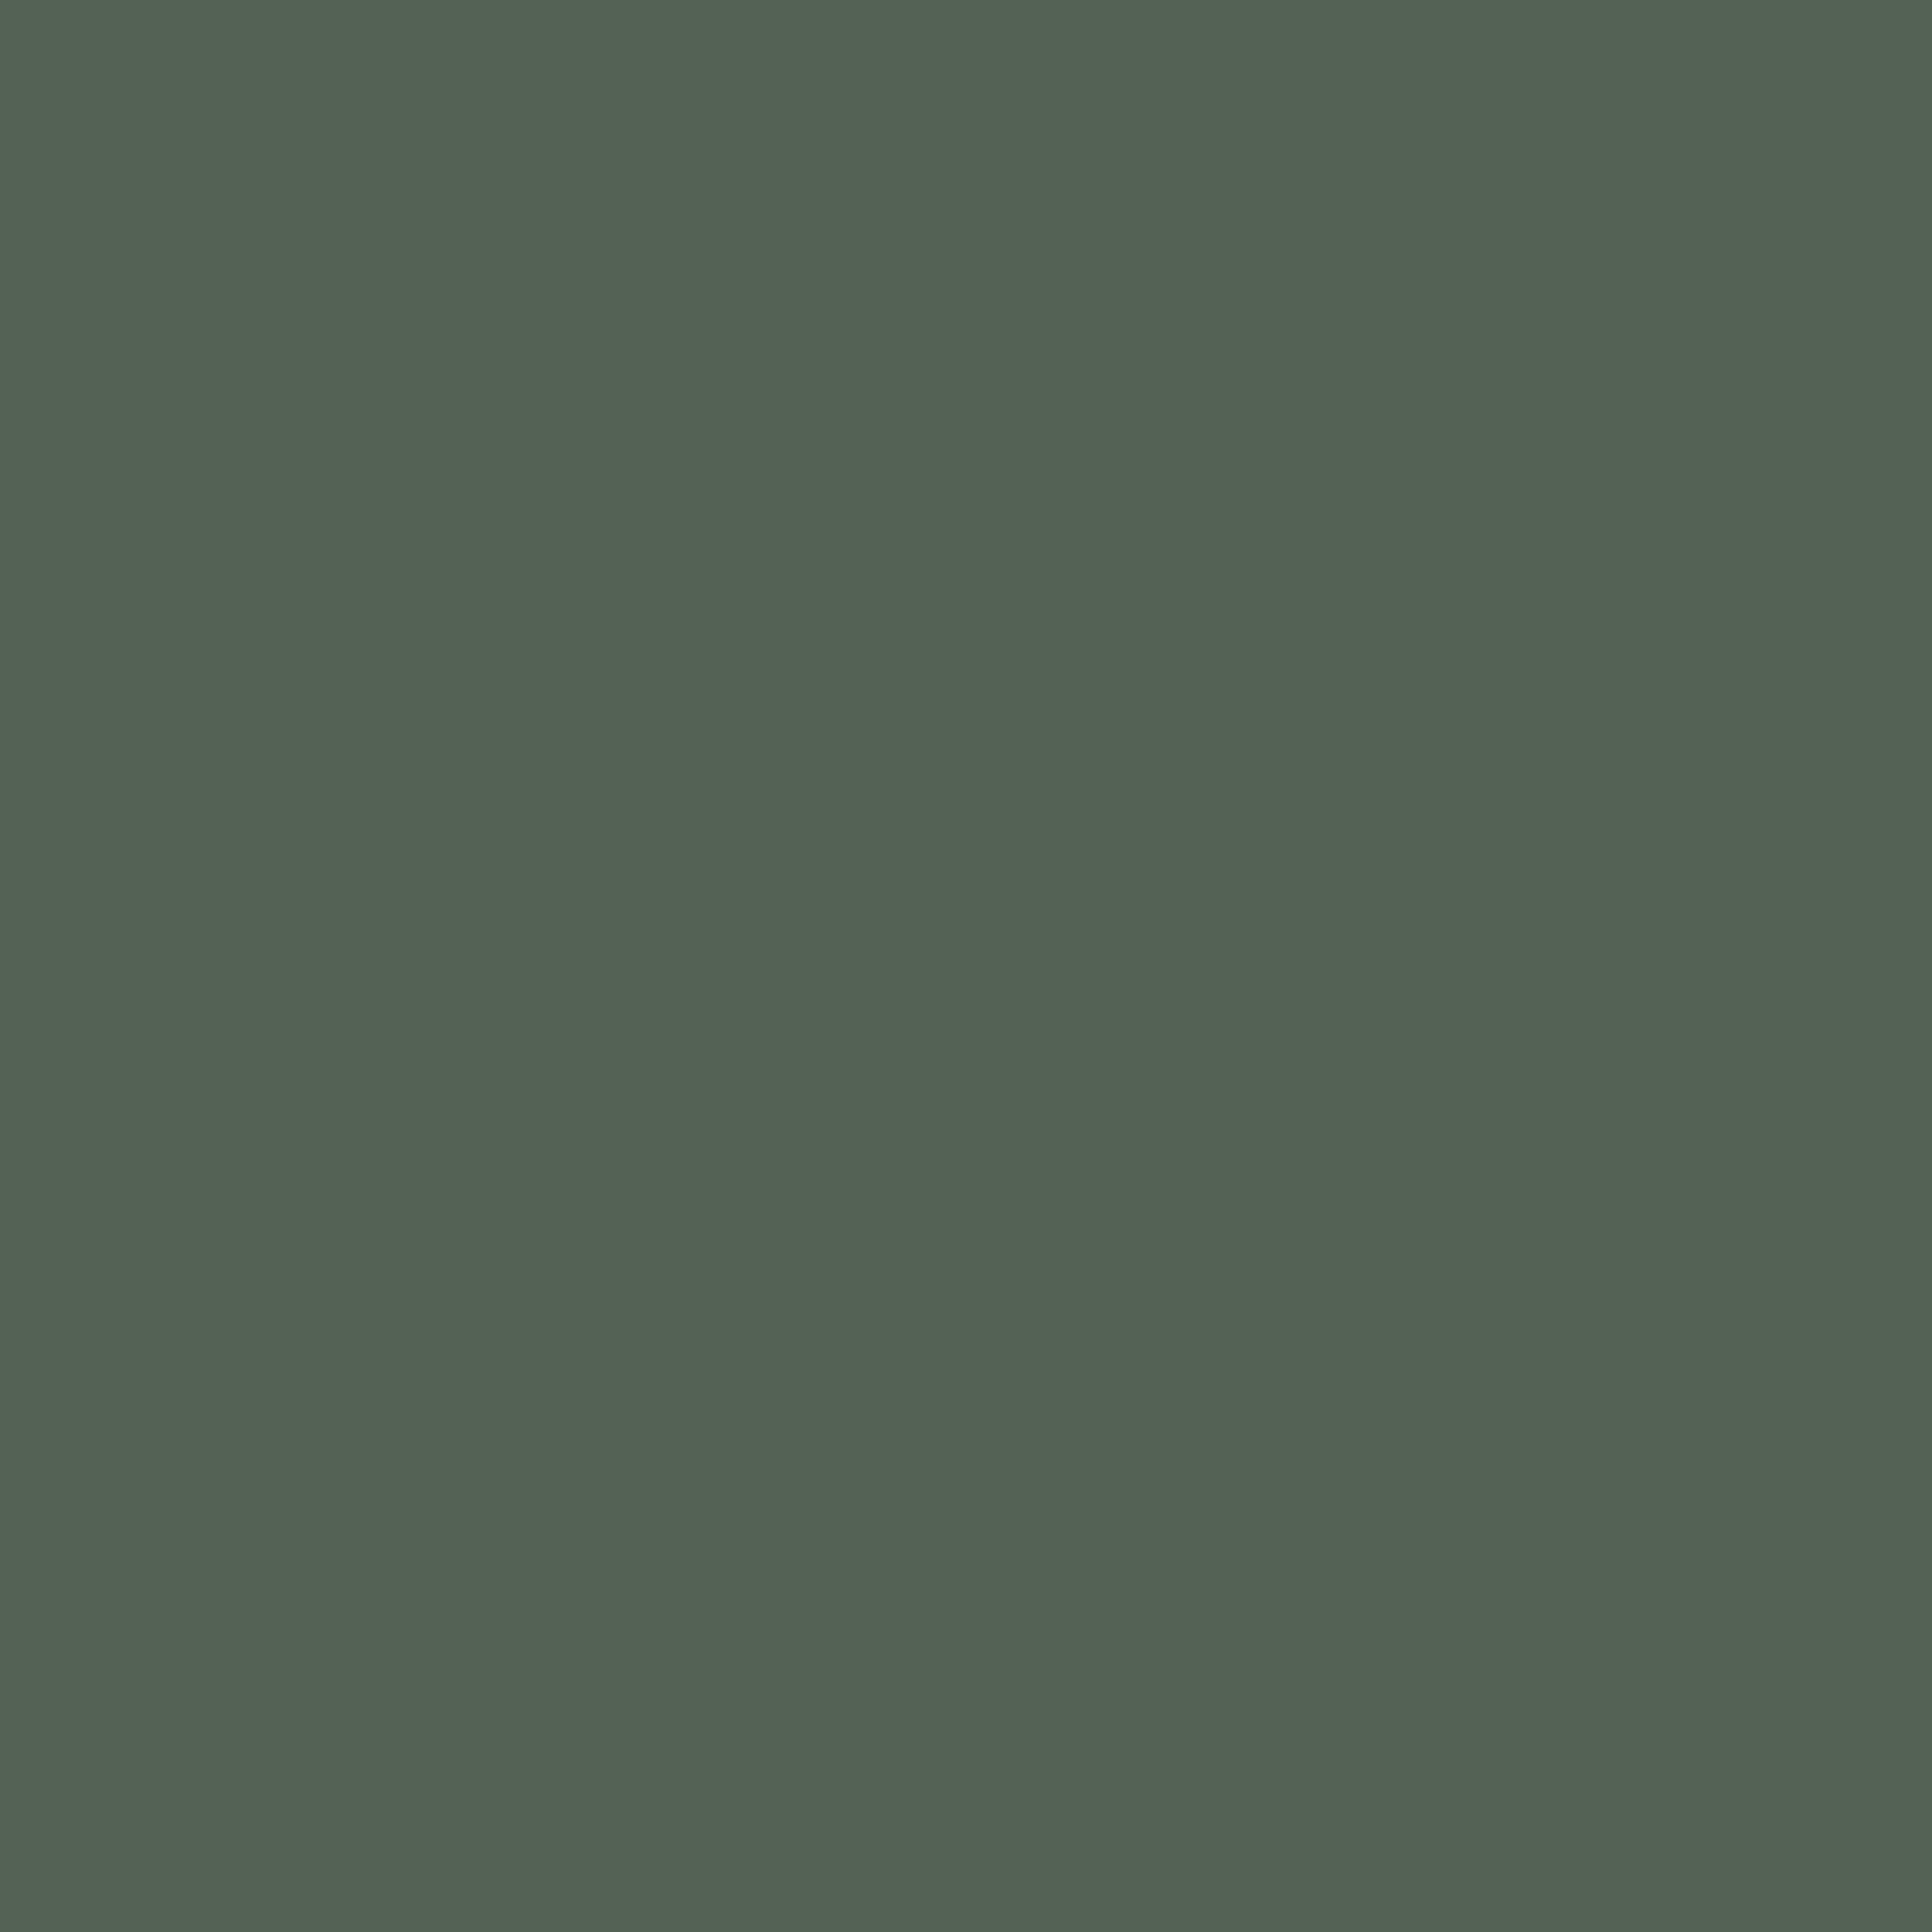 Wood Swatch :: Kale